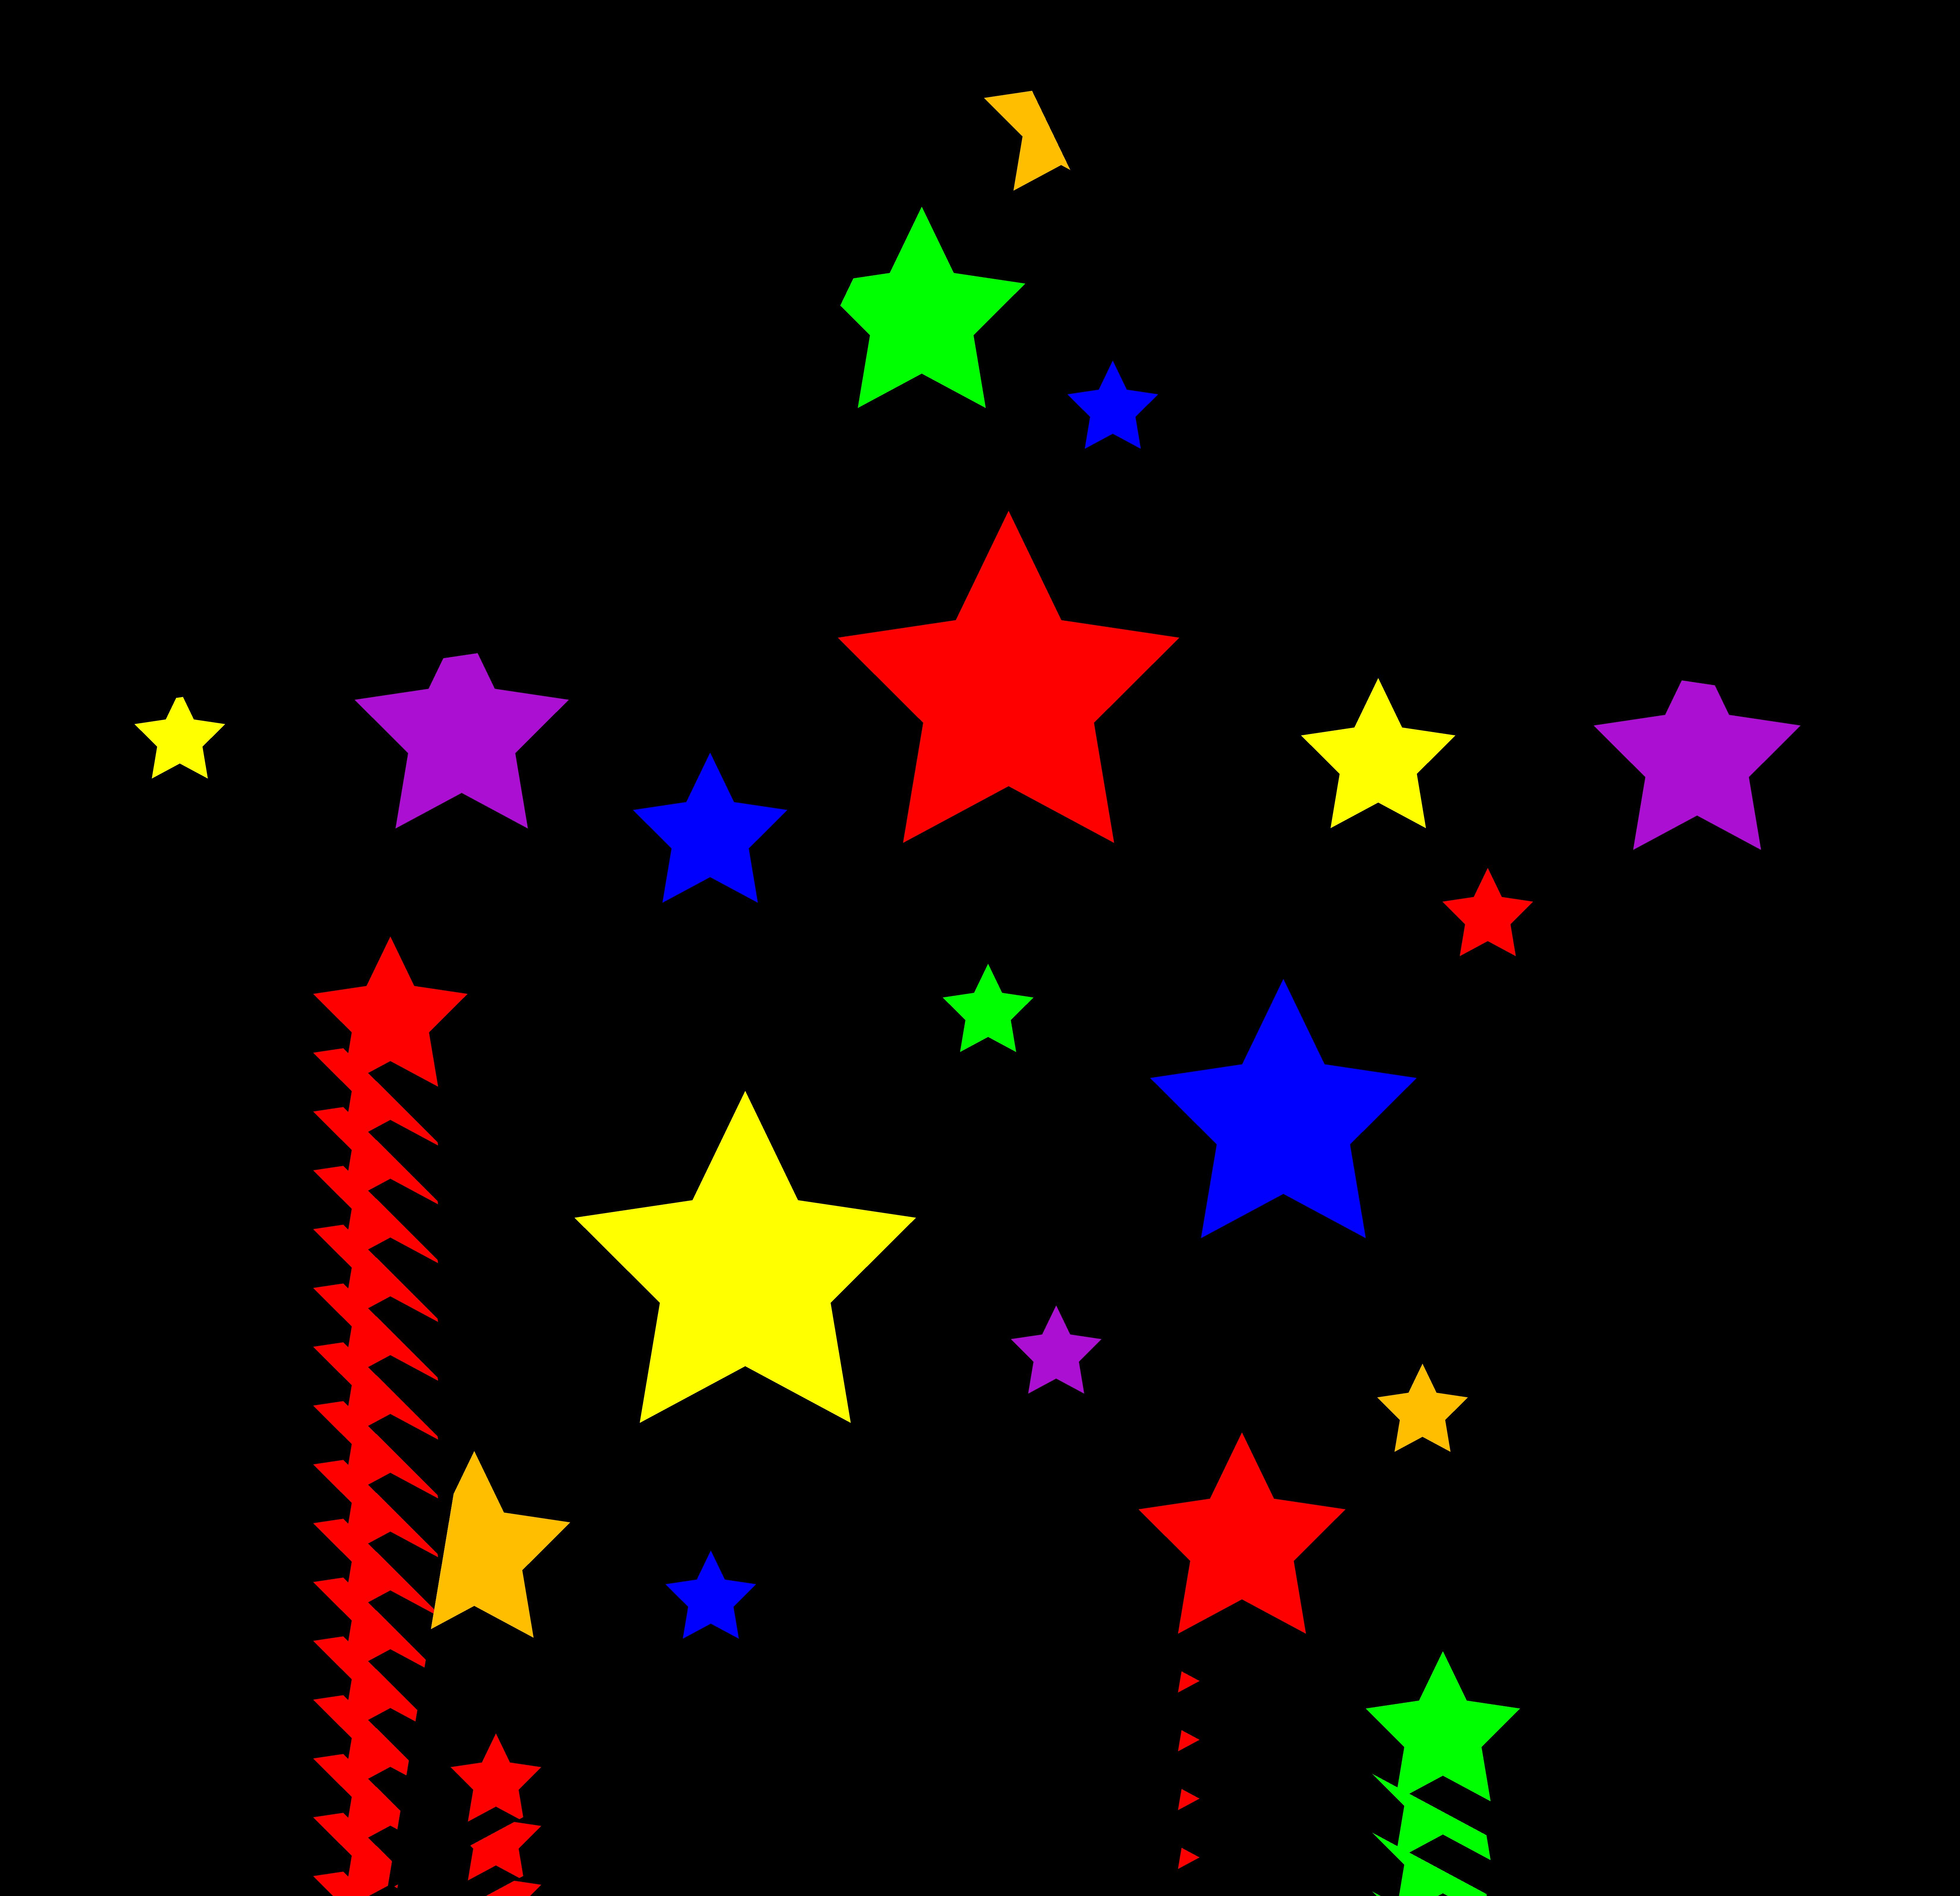 6598x6383 Shooting Star Clipart Colourful Star